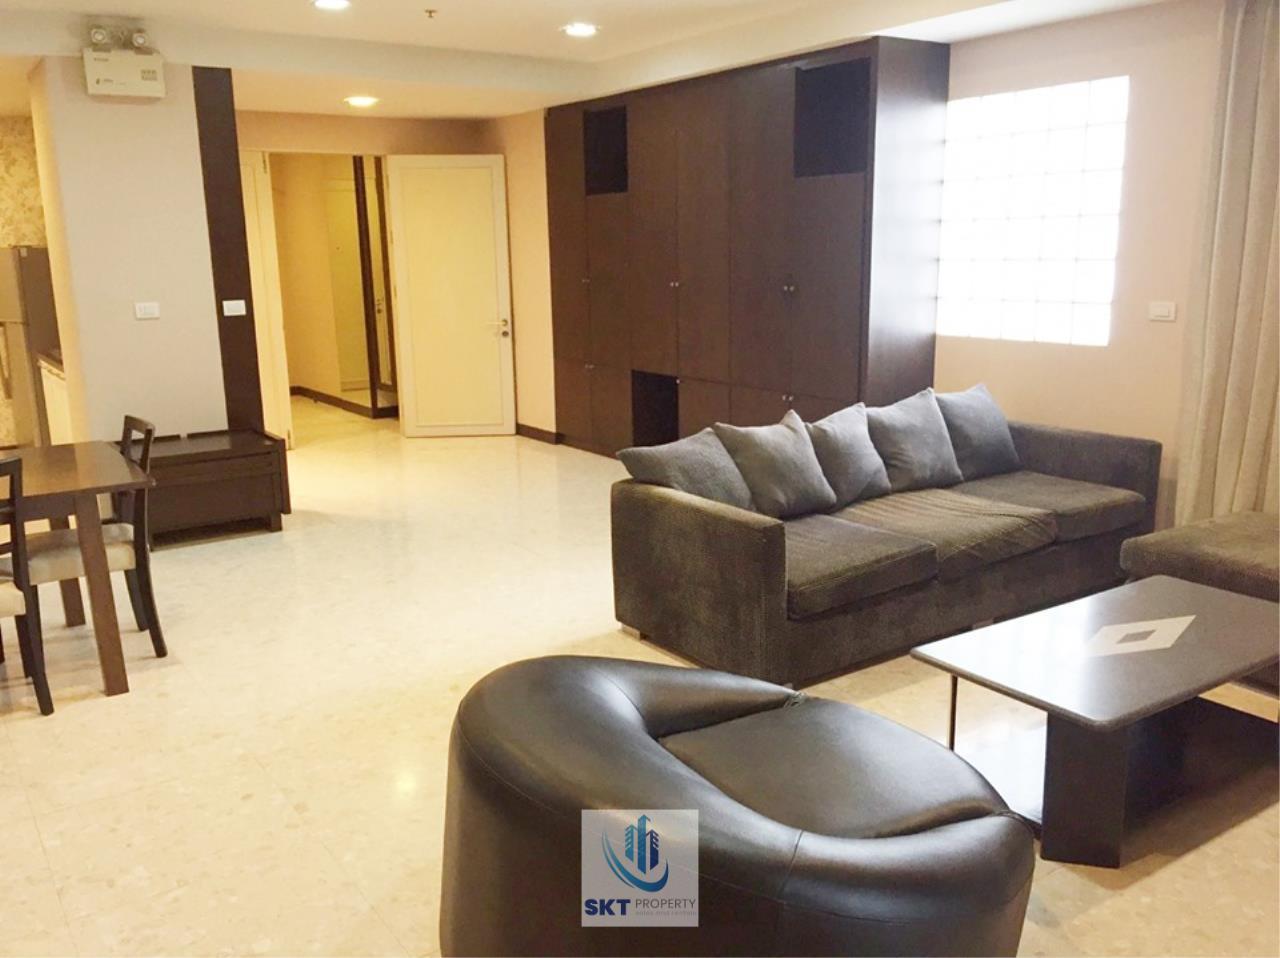 Sukritta Property Agency's Nusasiri grand condo neat BTS Ekamai 1